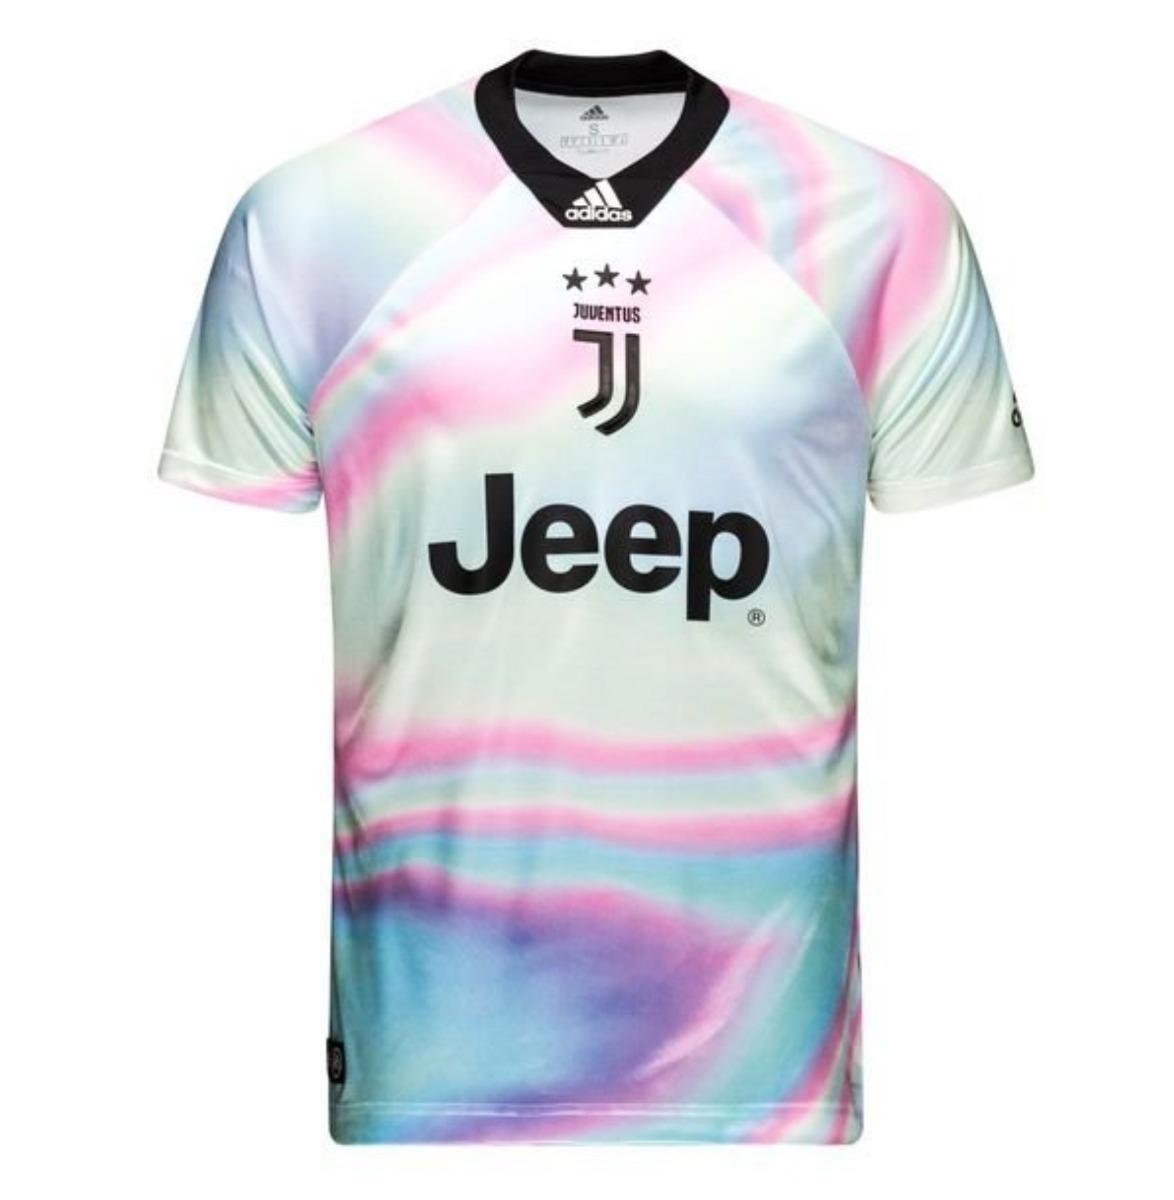 camisa adidas juventus fifa 2019 ea sports oficial p entrega. Carregando  zoom. e66112e91f129